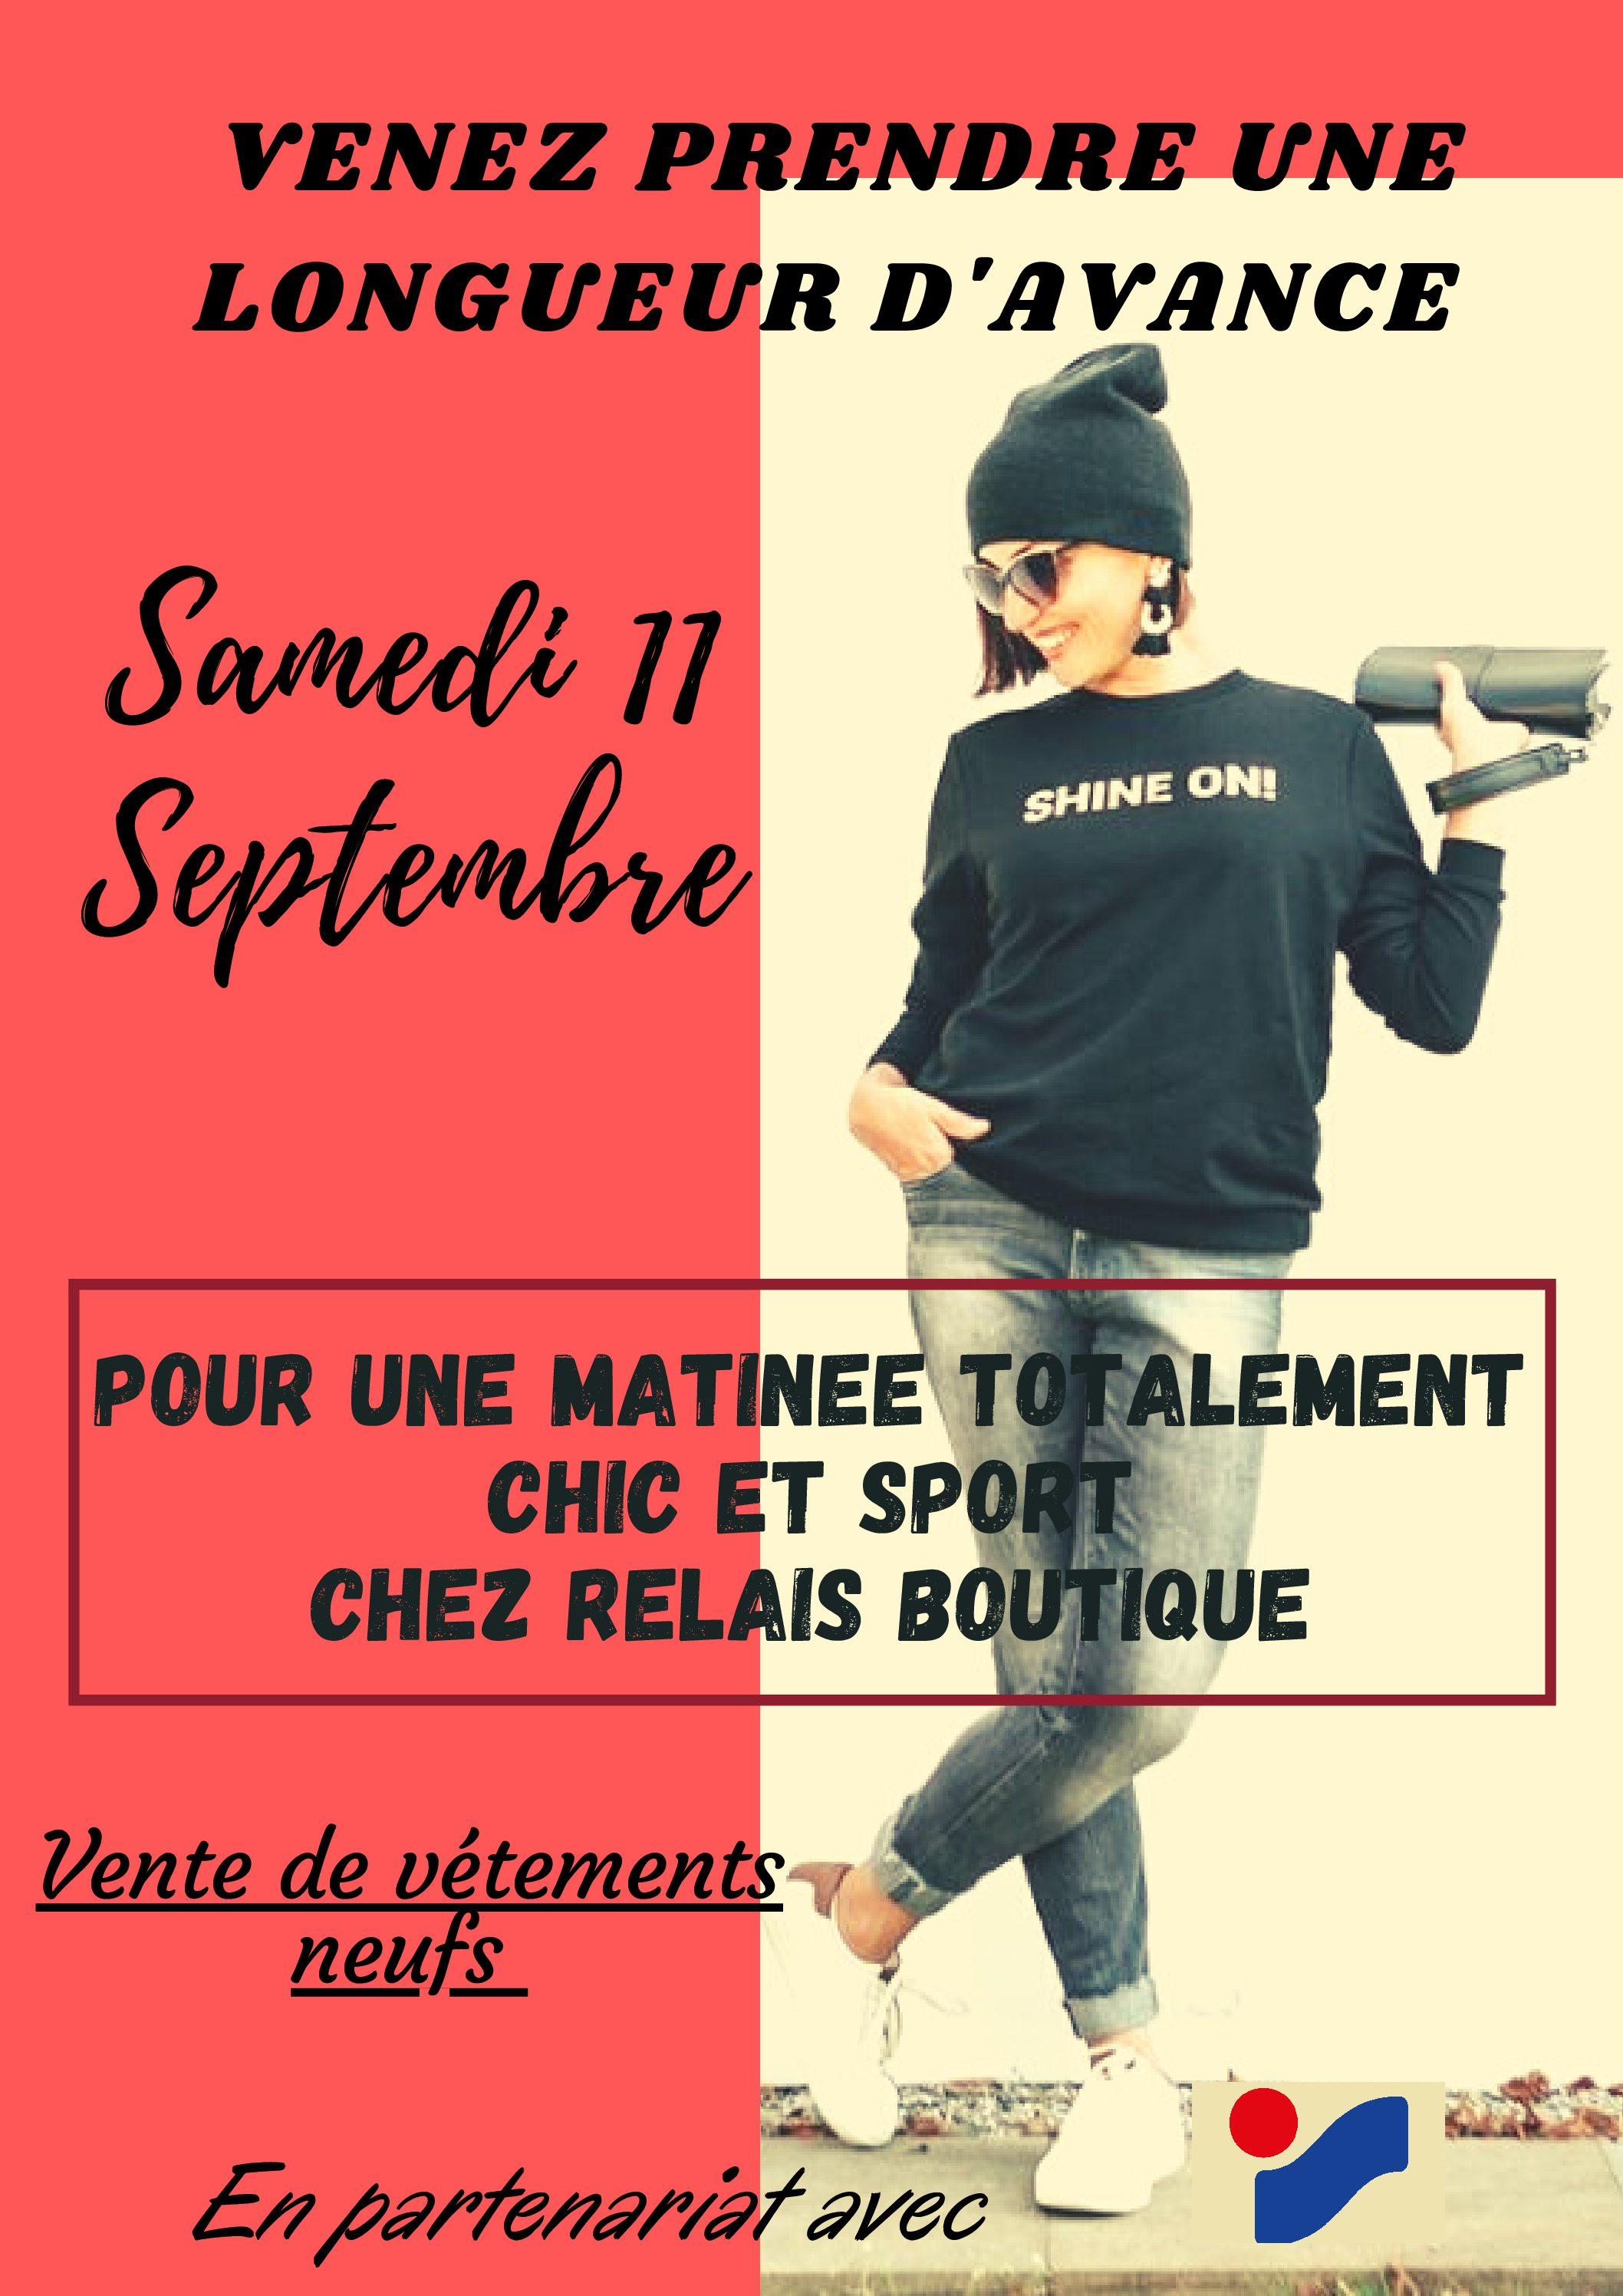 Ouverture Samedi 11 Septembre de Relais Boutique